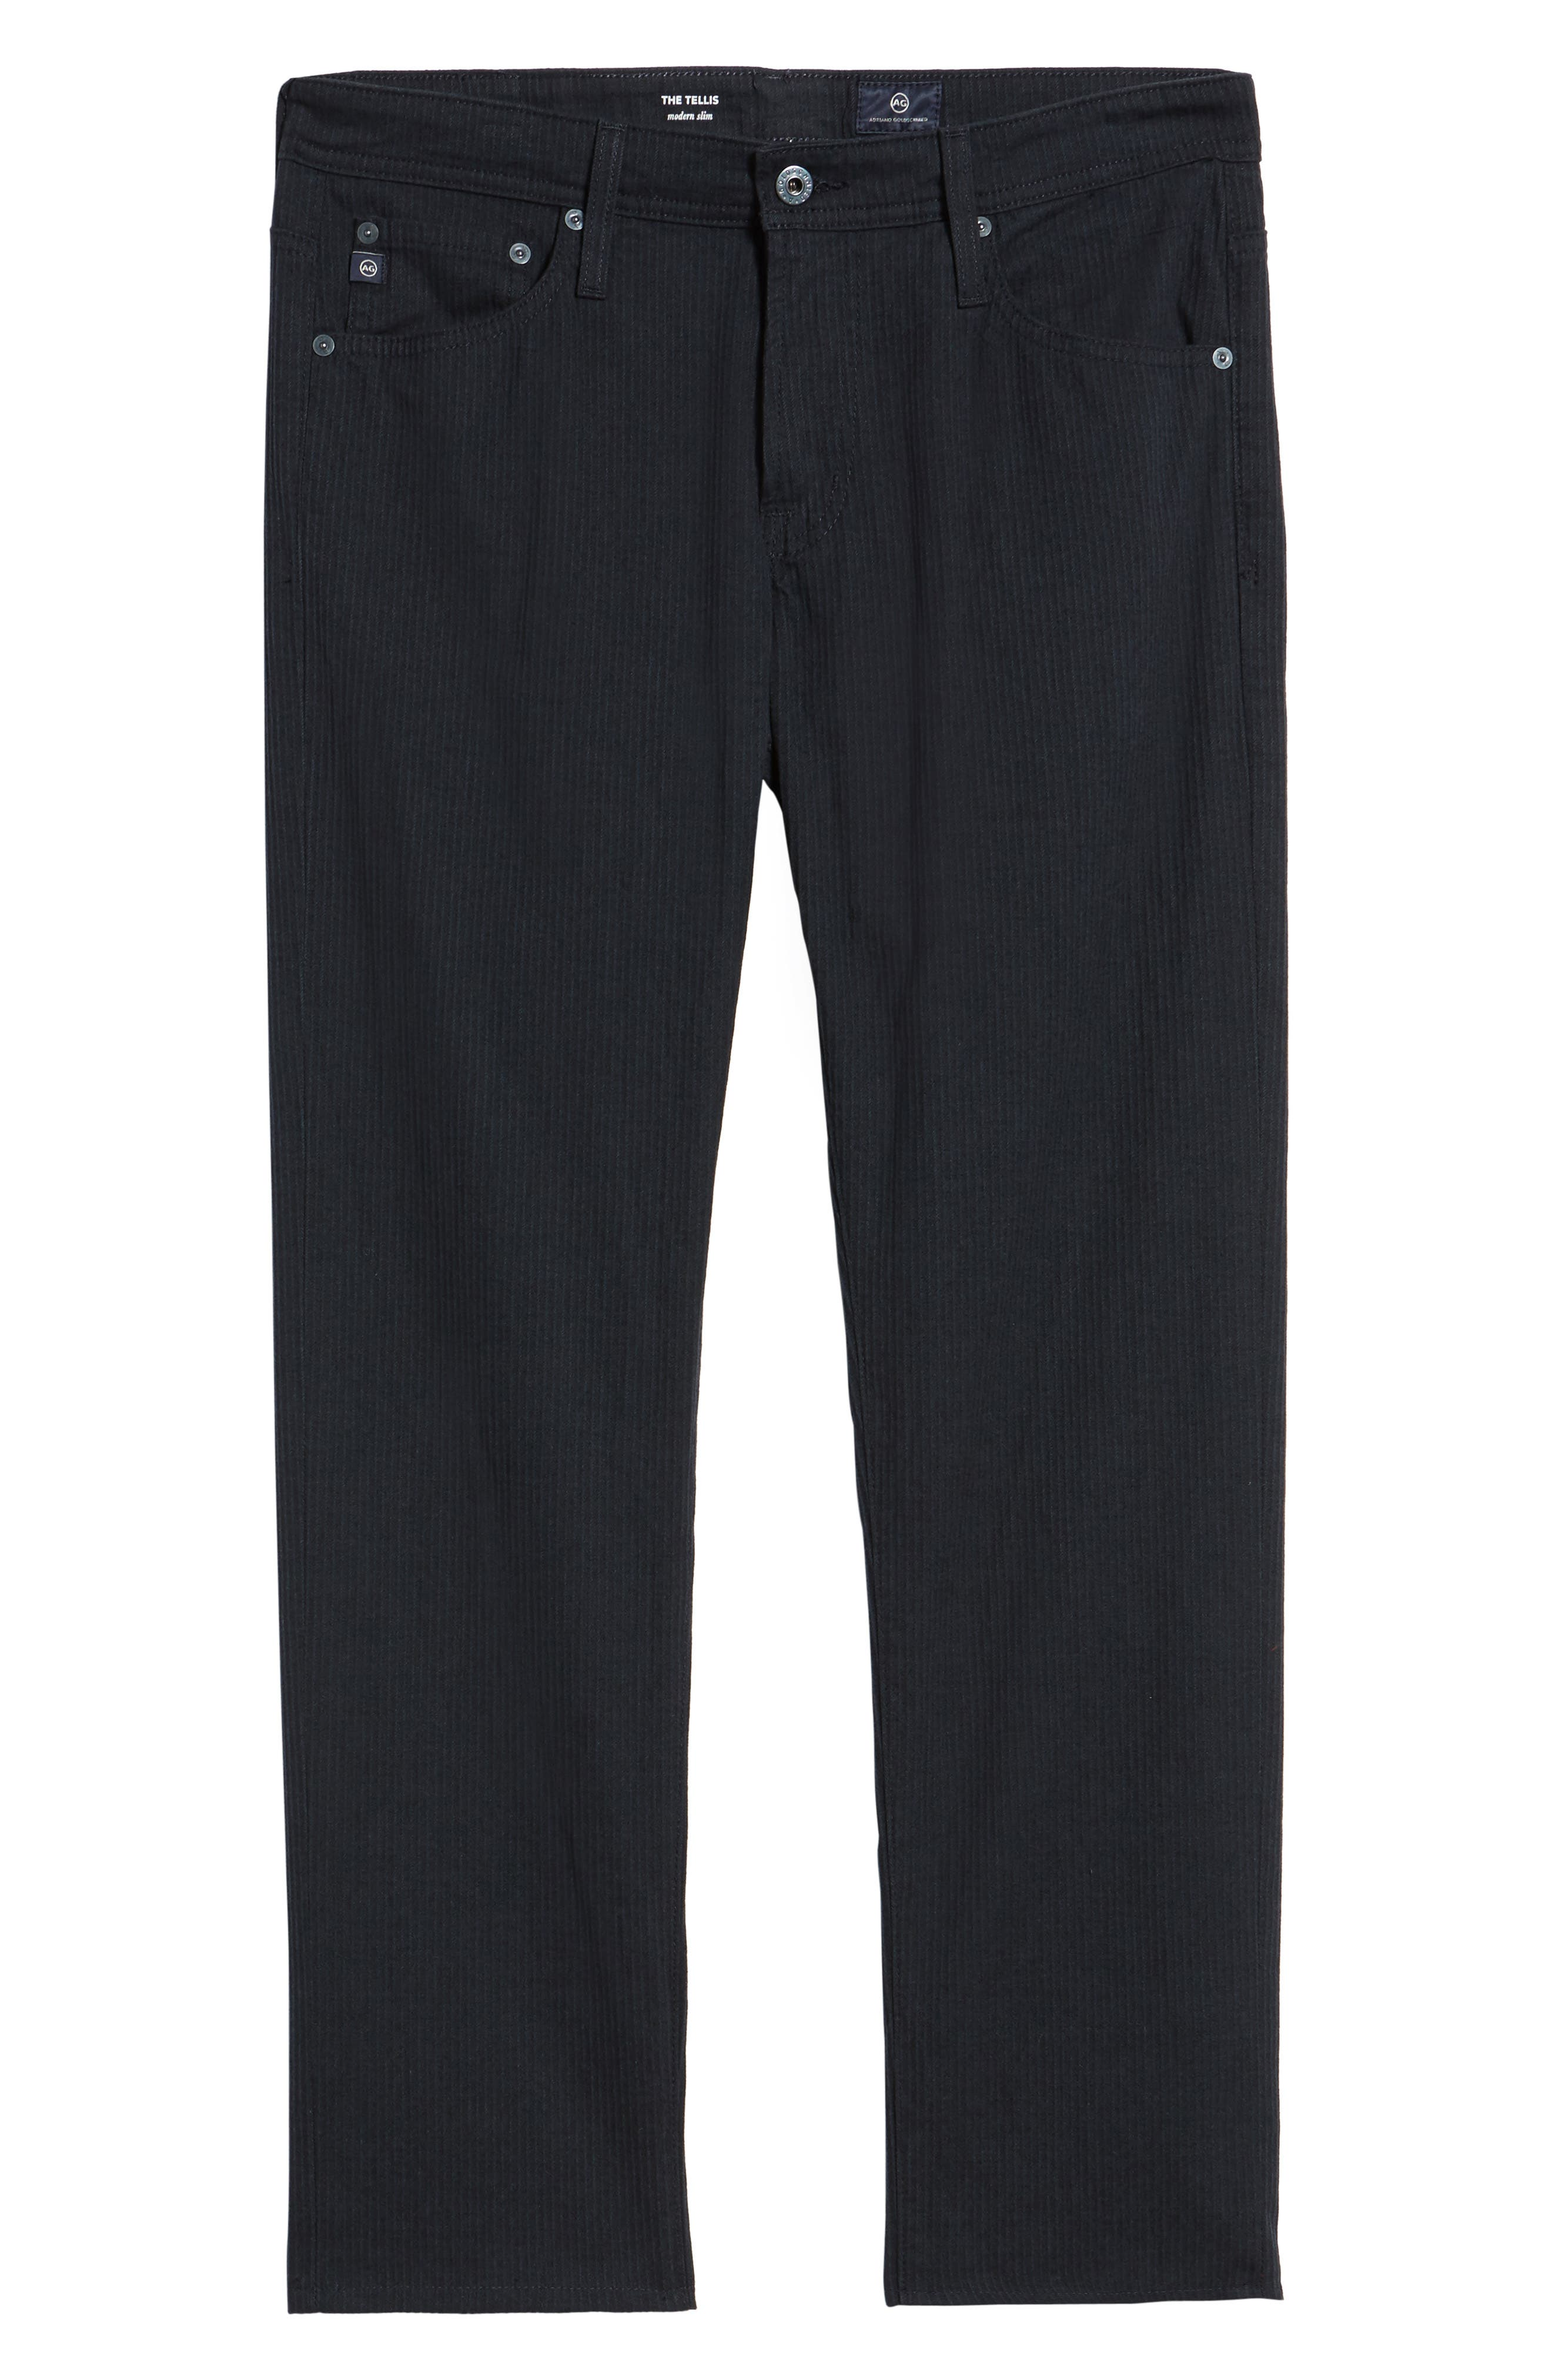 Tellis Modern Slim Stripe Five-Pocket Pants,                             Alternate thumbnail 6, color,                             Midnight Shadow